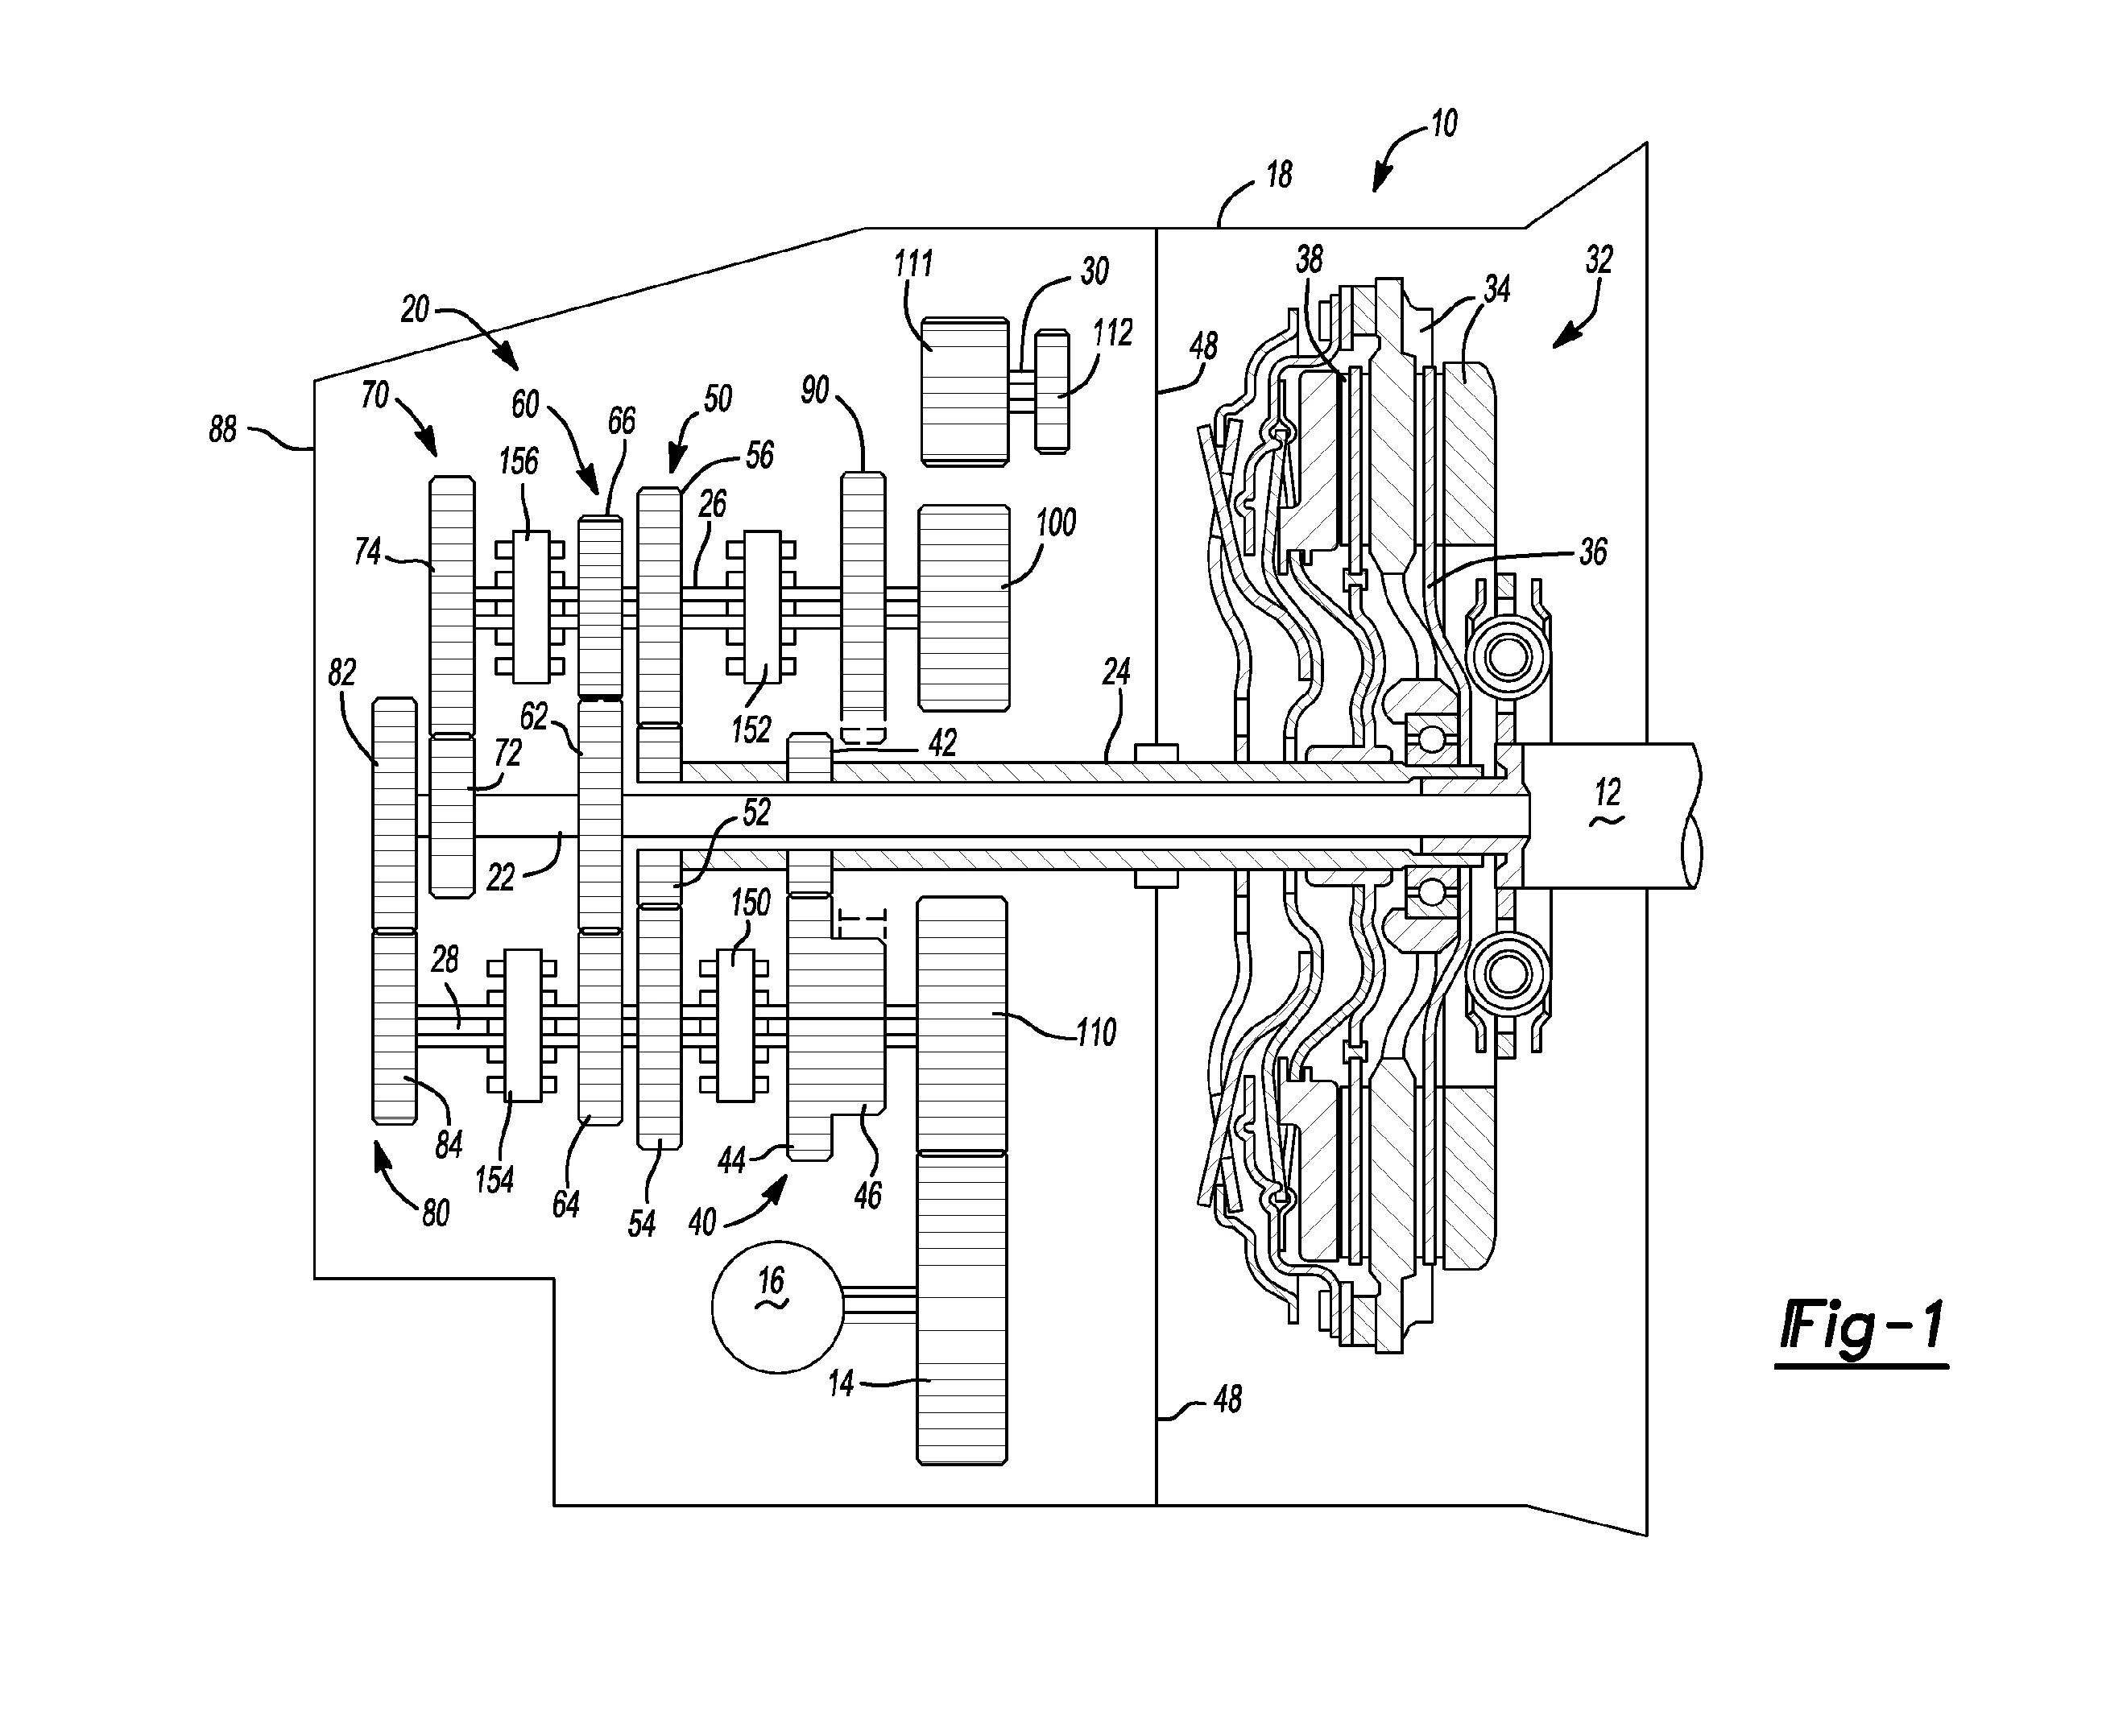 hight resolution of gm dual clutch transmission gm high tech performance suzuki clutch diagram gm clutch diagram